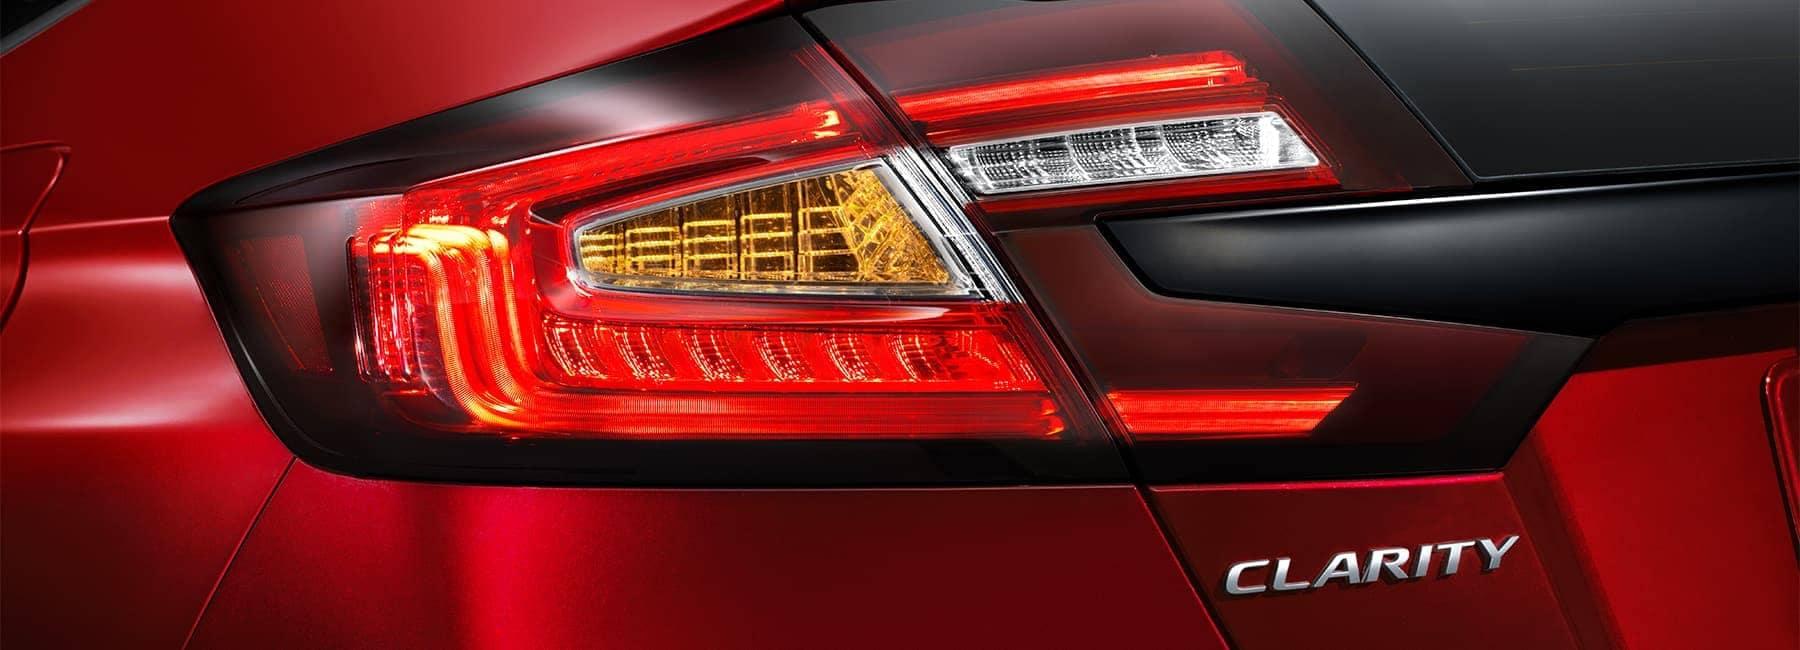 2020-Honda-Clarity-rear-view-banner